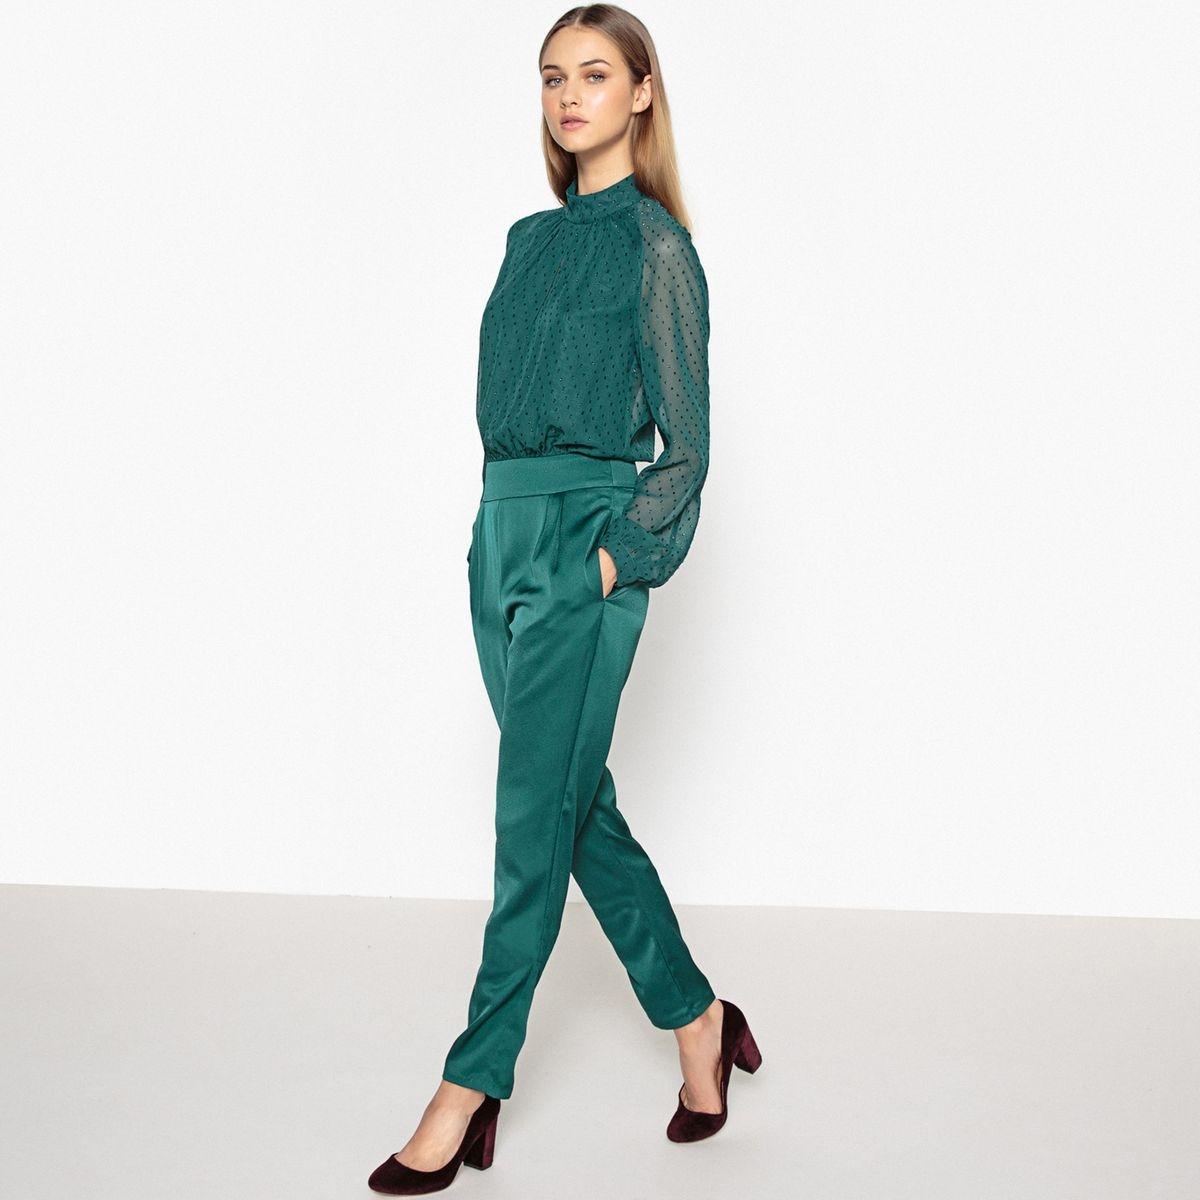 Combinaison pantalon plumetis